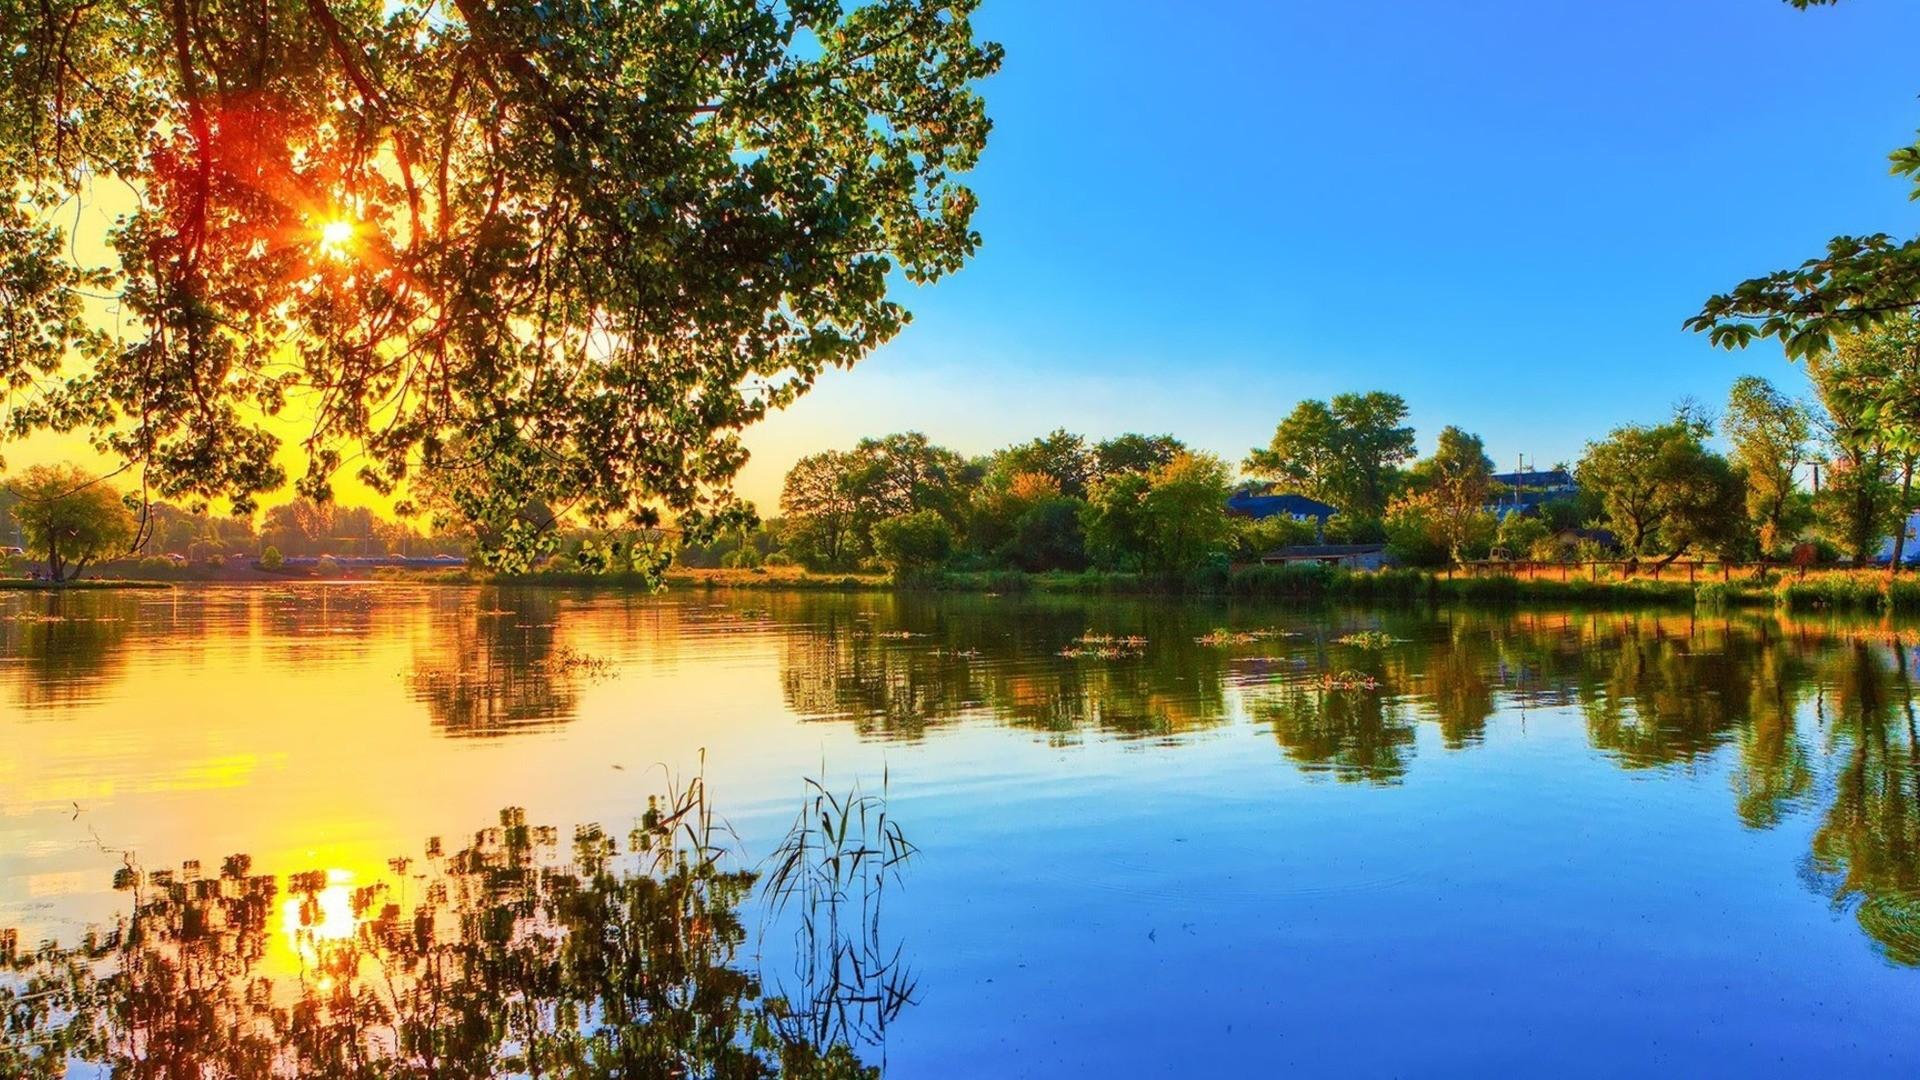 1080p Nature Wallpaper (67+ images)